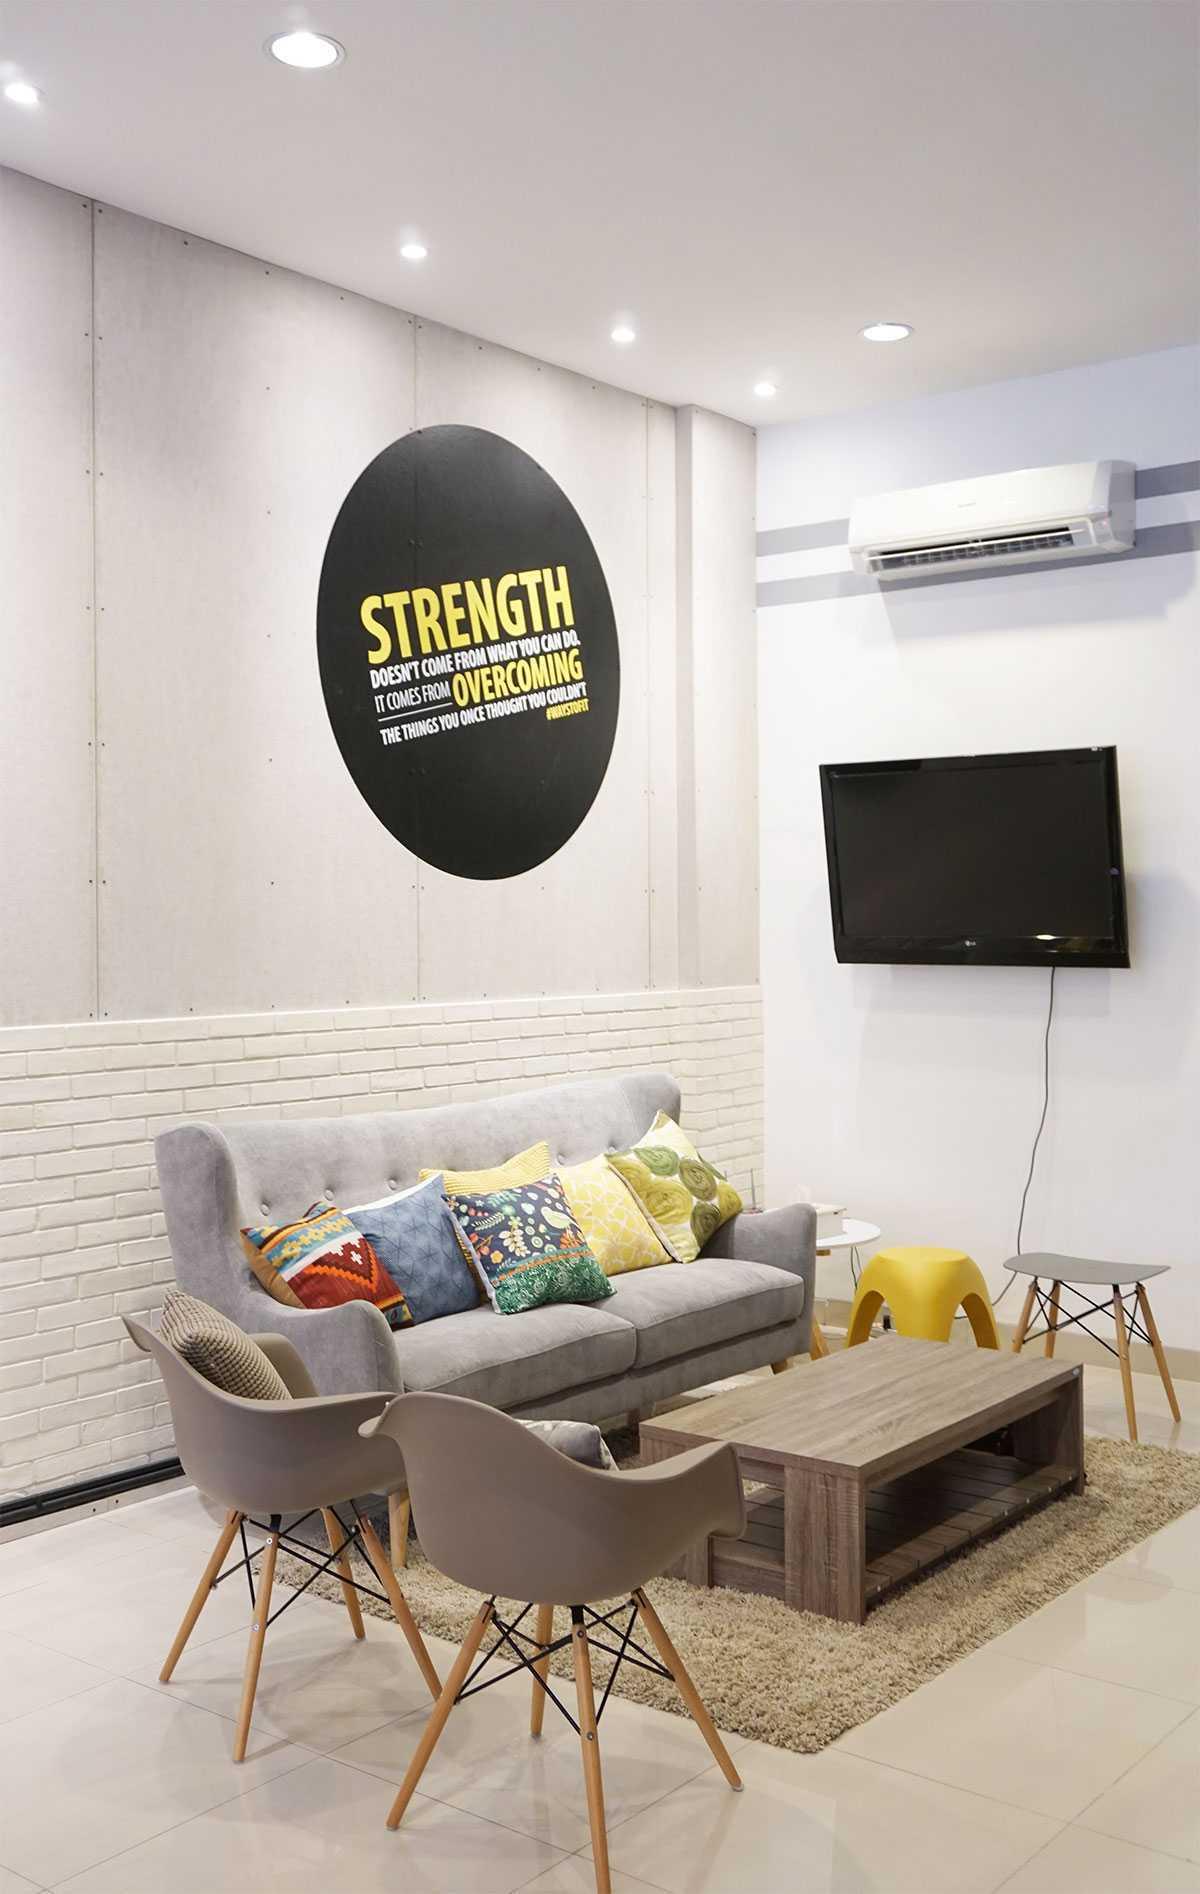 Foto inspirasi ide desain gym minimalis Guest room oleh Vindo Design di Arsitag